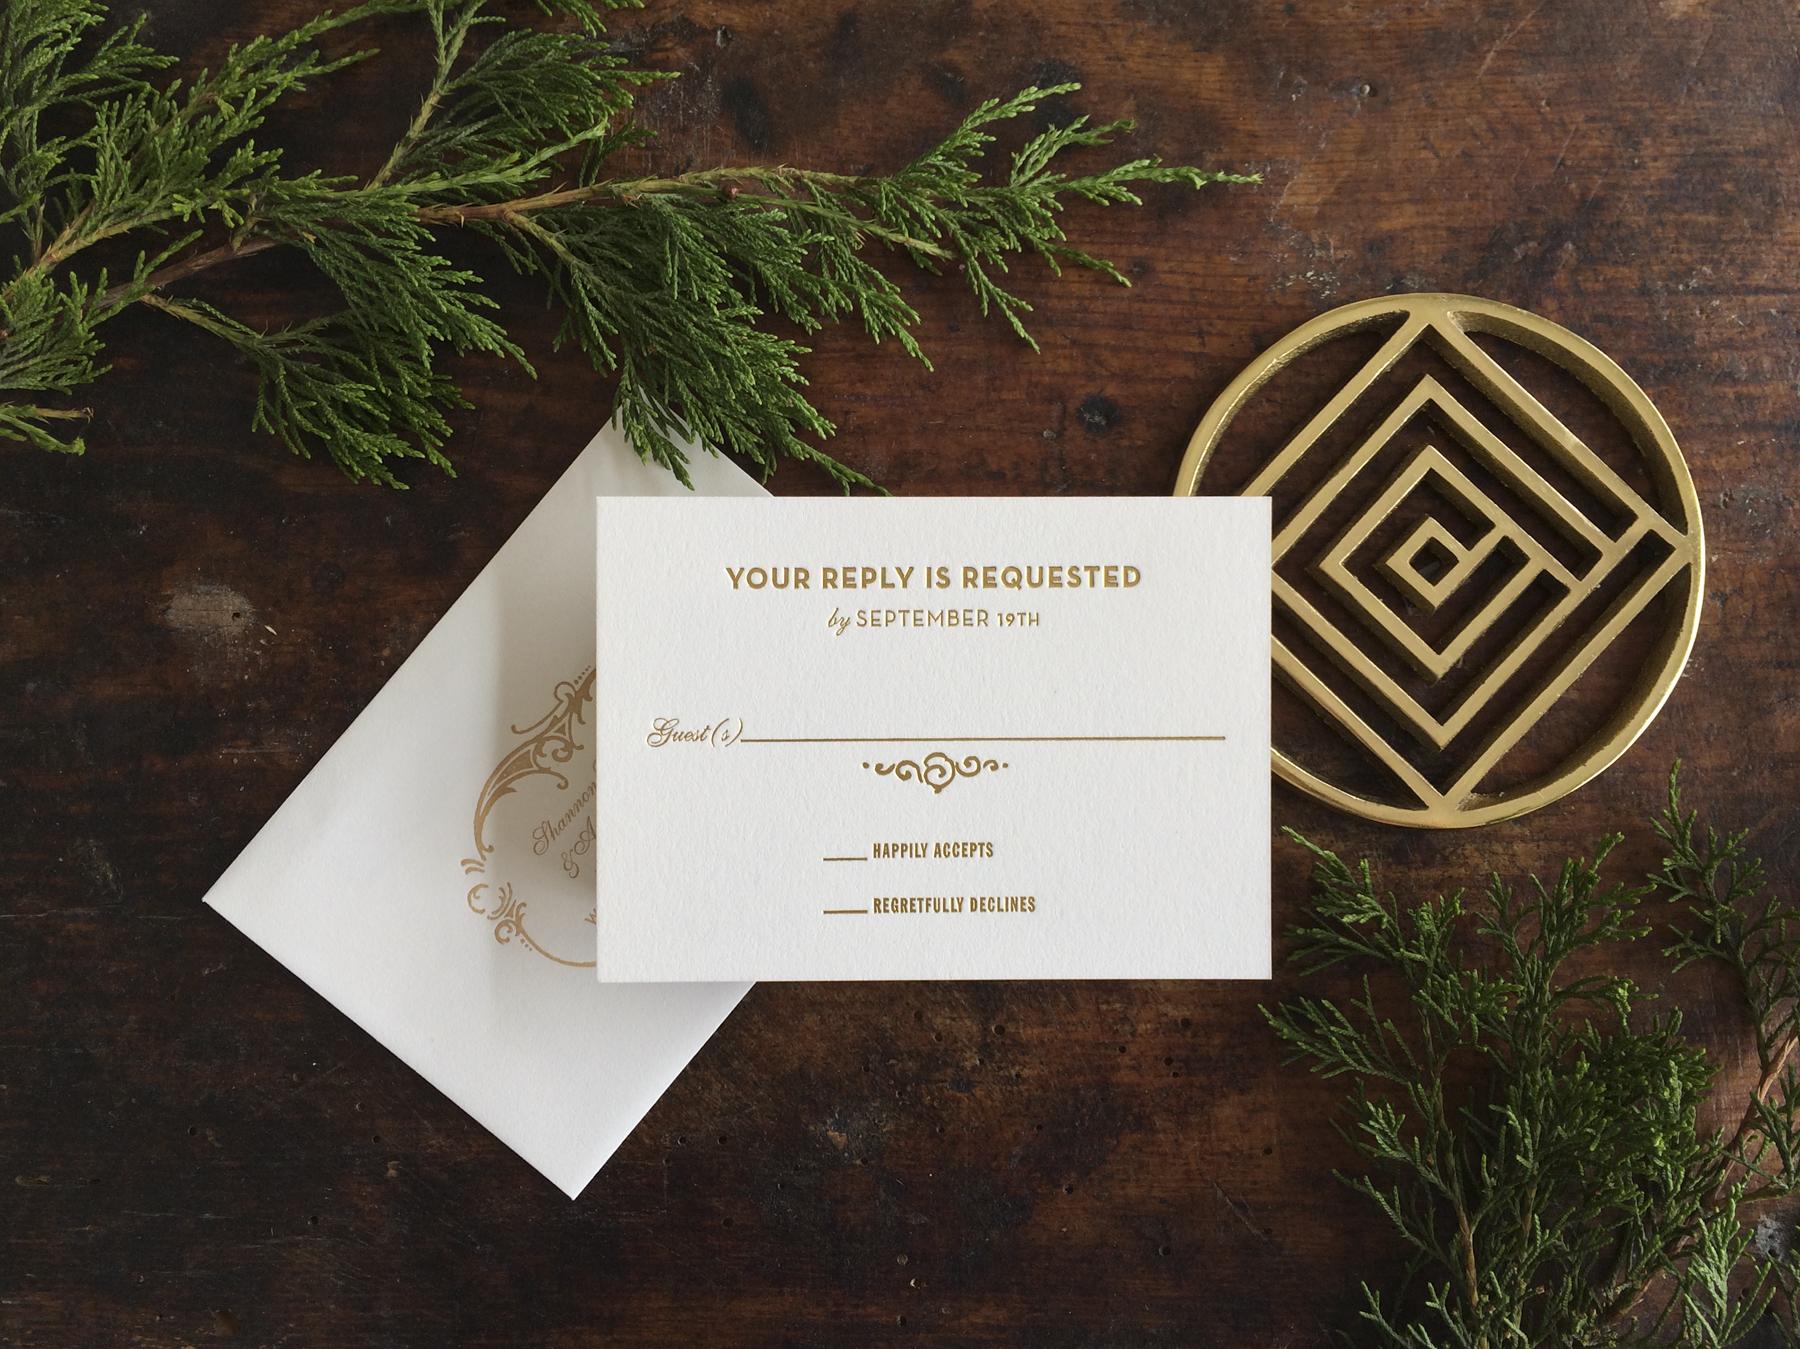 gatsby-gold-letterpress-wedding-invitation.jpg